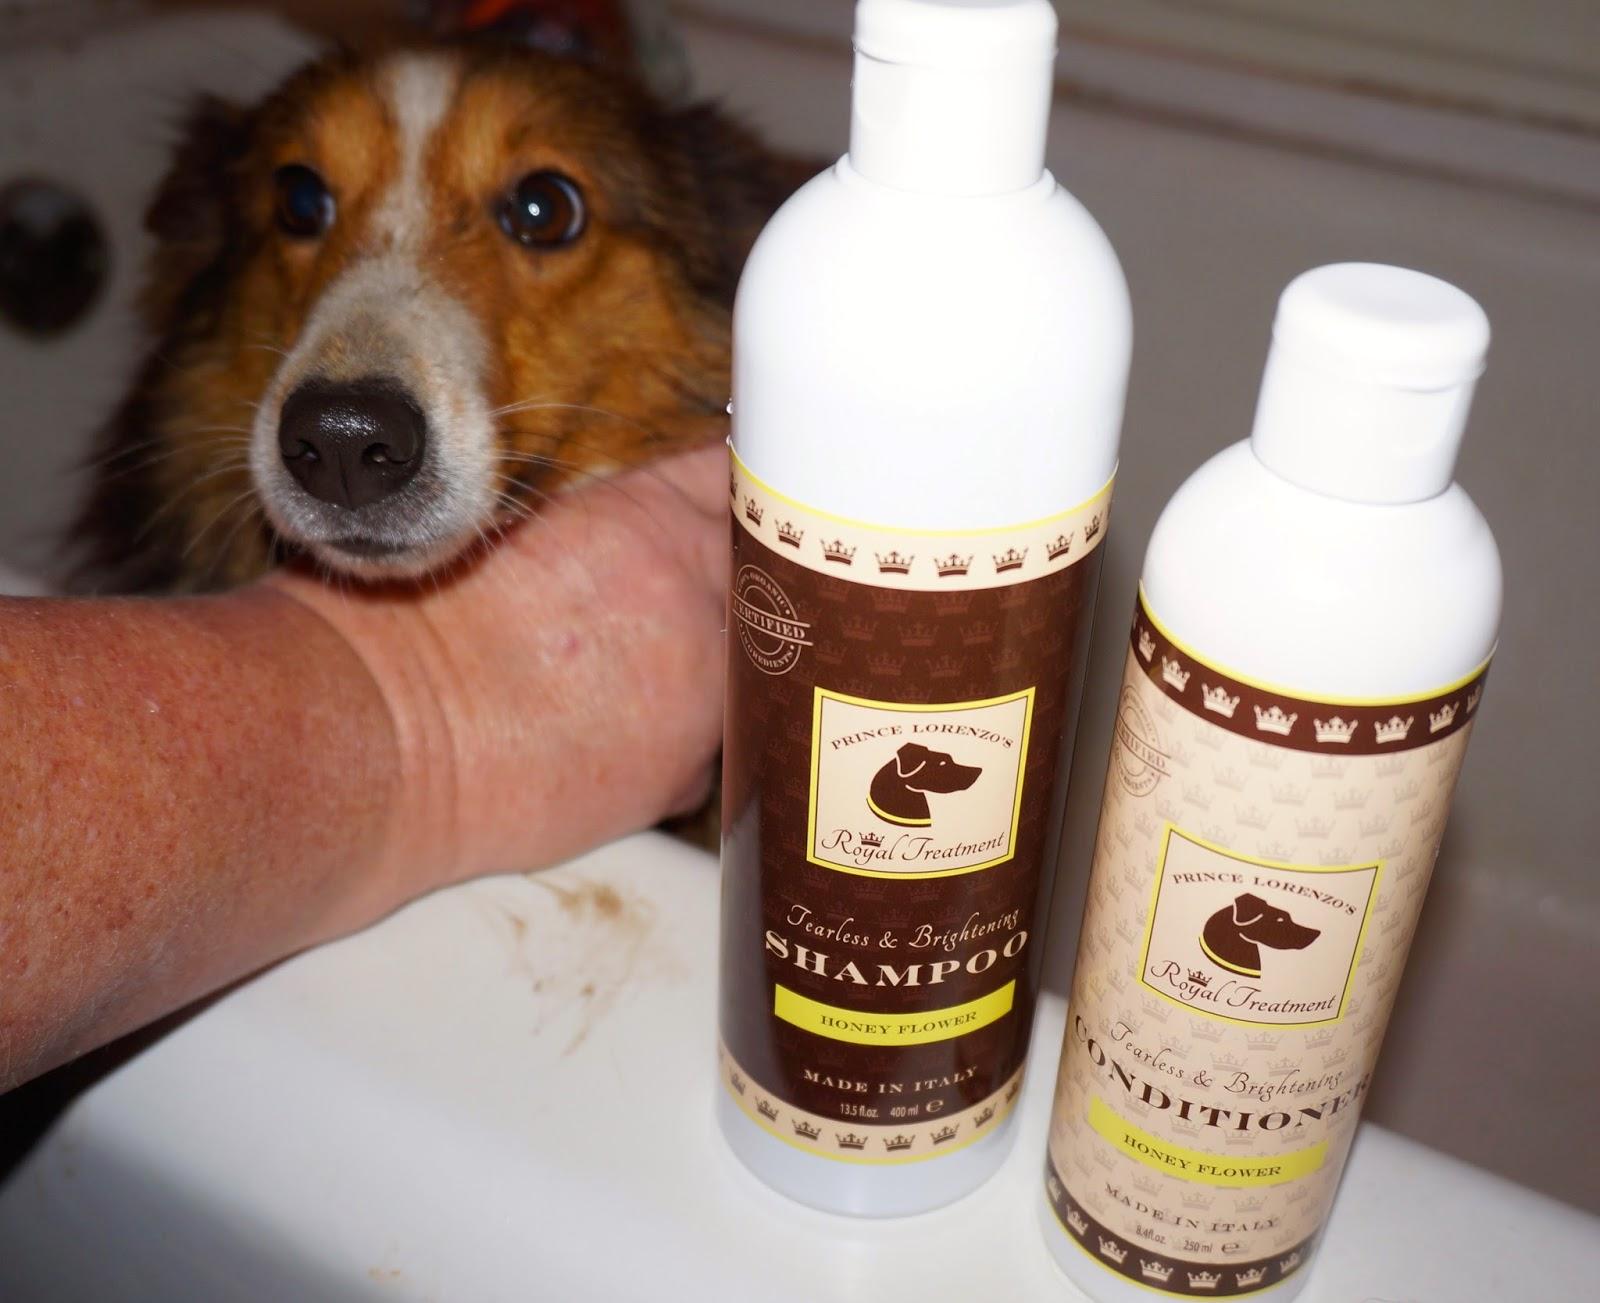 At the Fence: Royal Pet Club Organic Honey Flower Shampoo and